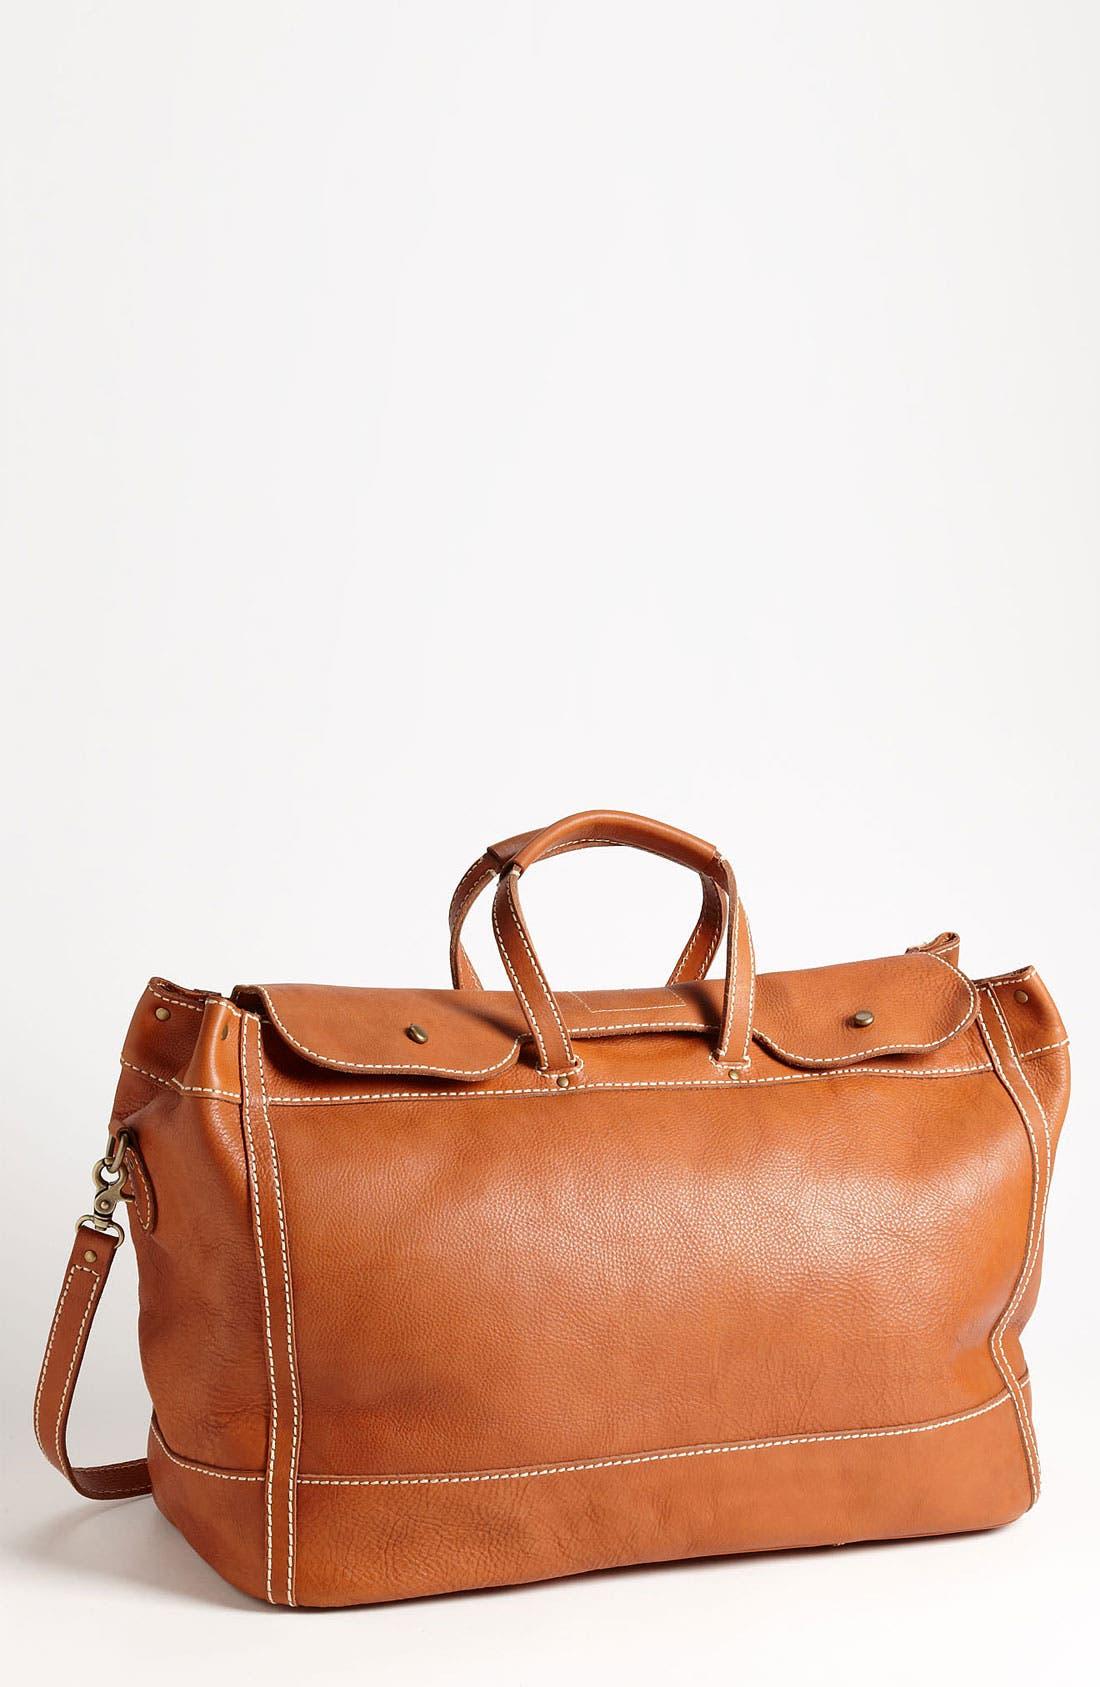 Alternate Image 1 Selected - Jean Shop 'Signature' Bag